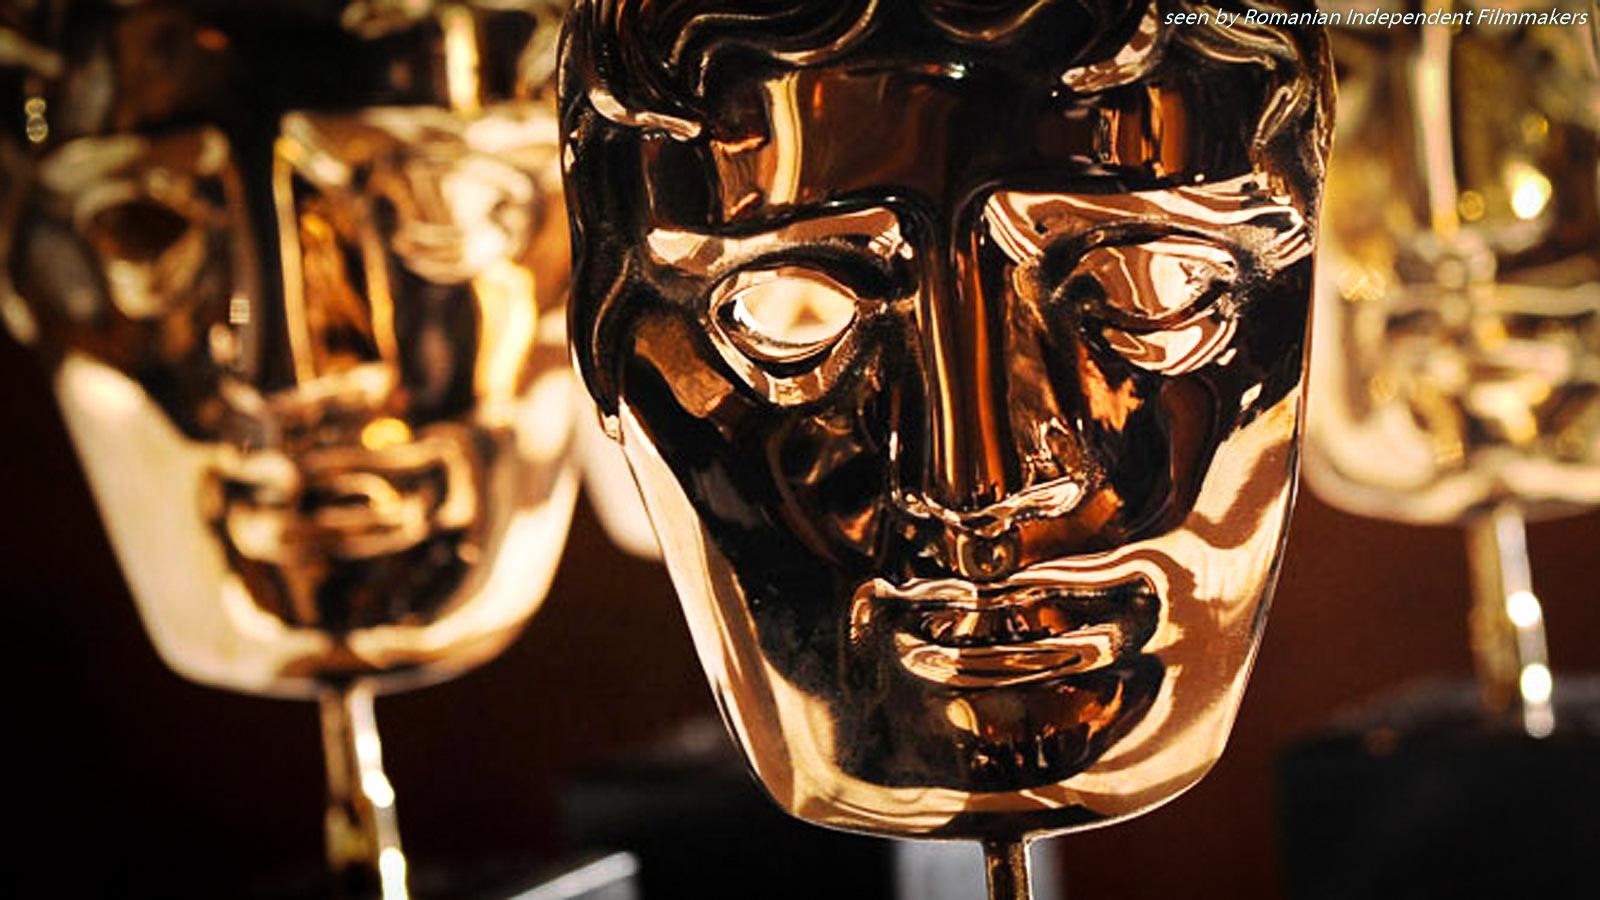 Premiile BAFTA 2016